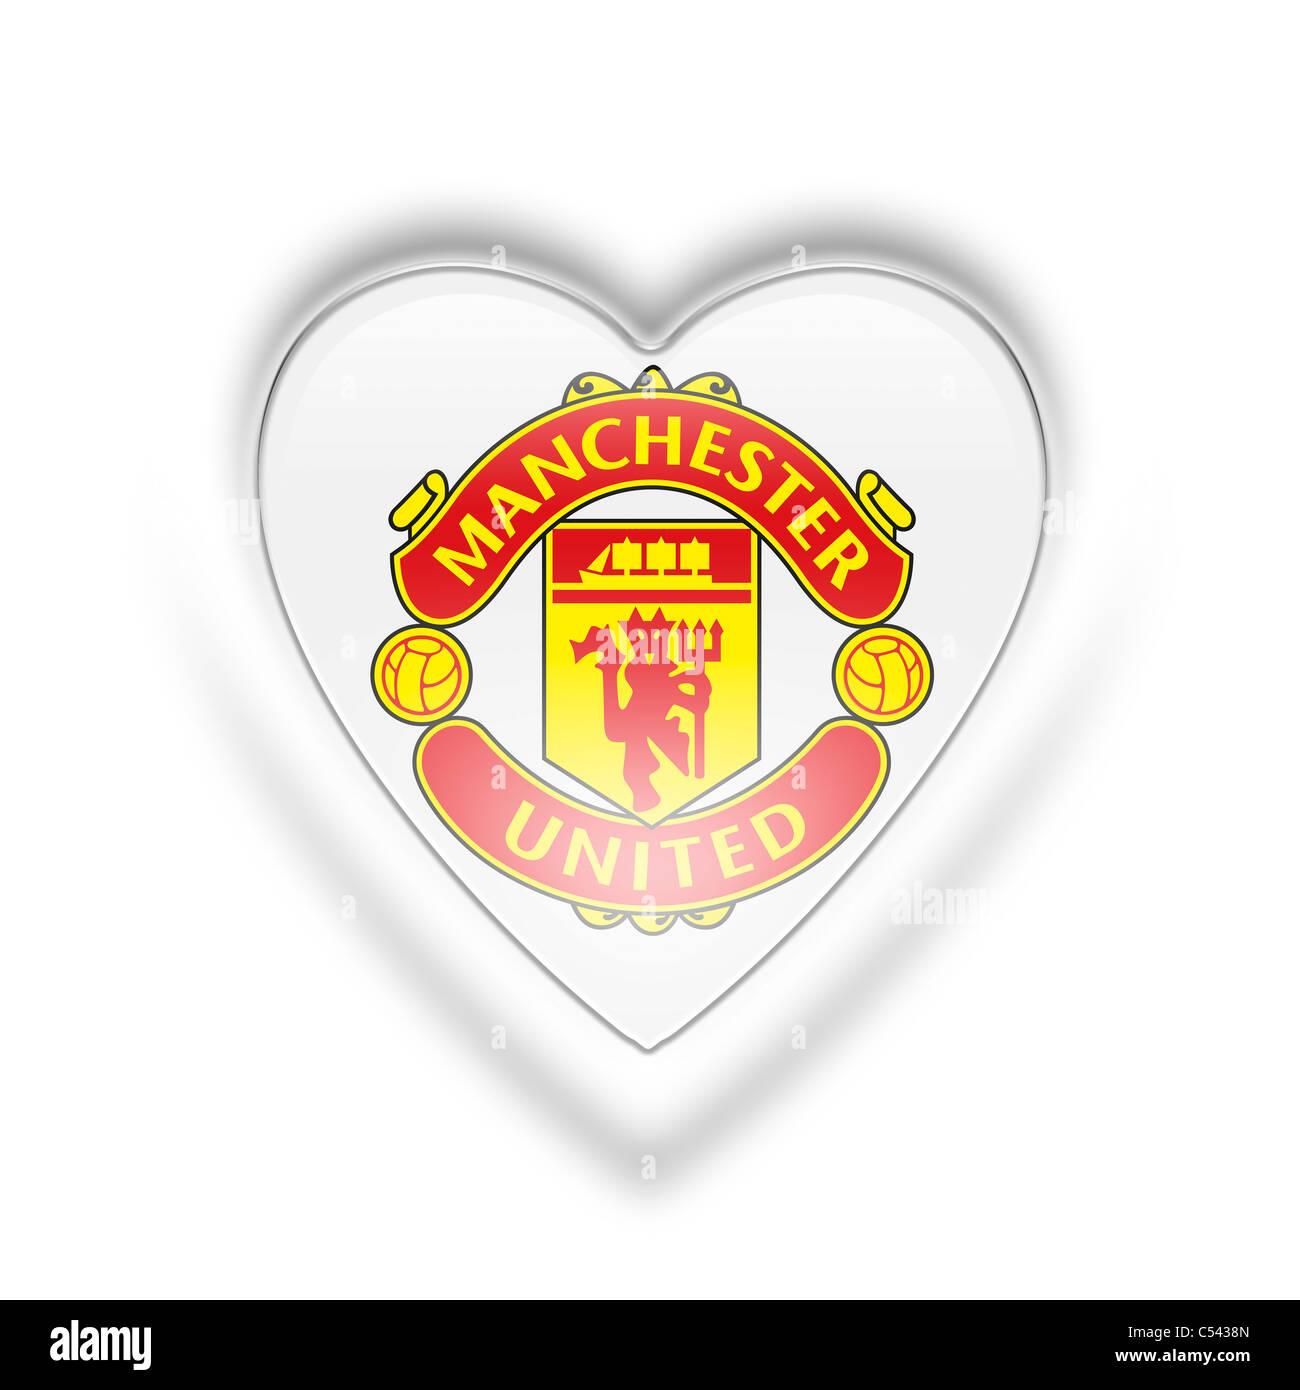 Manchester united flag logo symbol icon stock photo 37584421 alamy manchester united flag logo symbol icon voltagebd Images